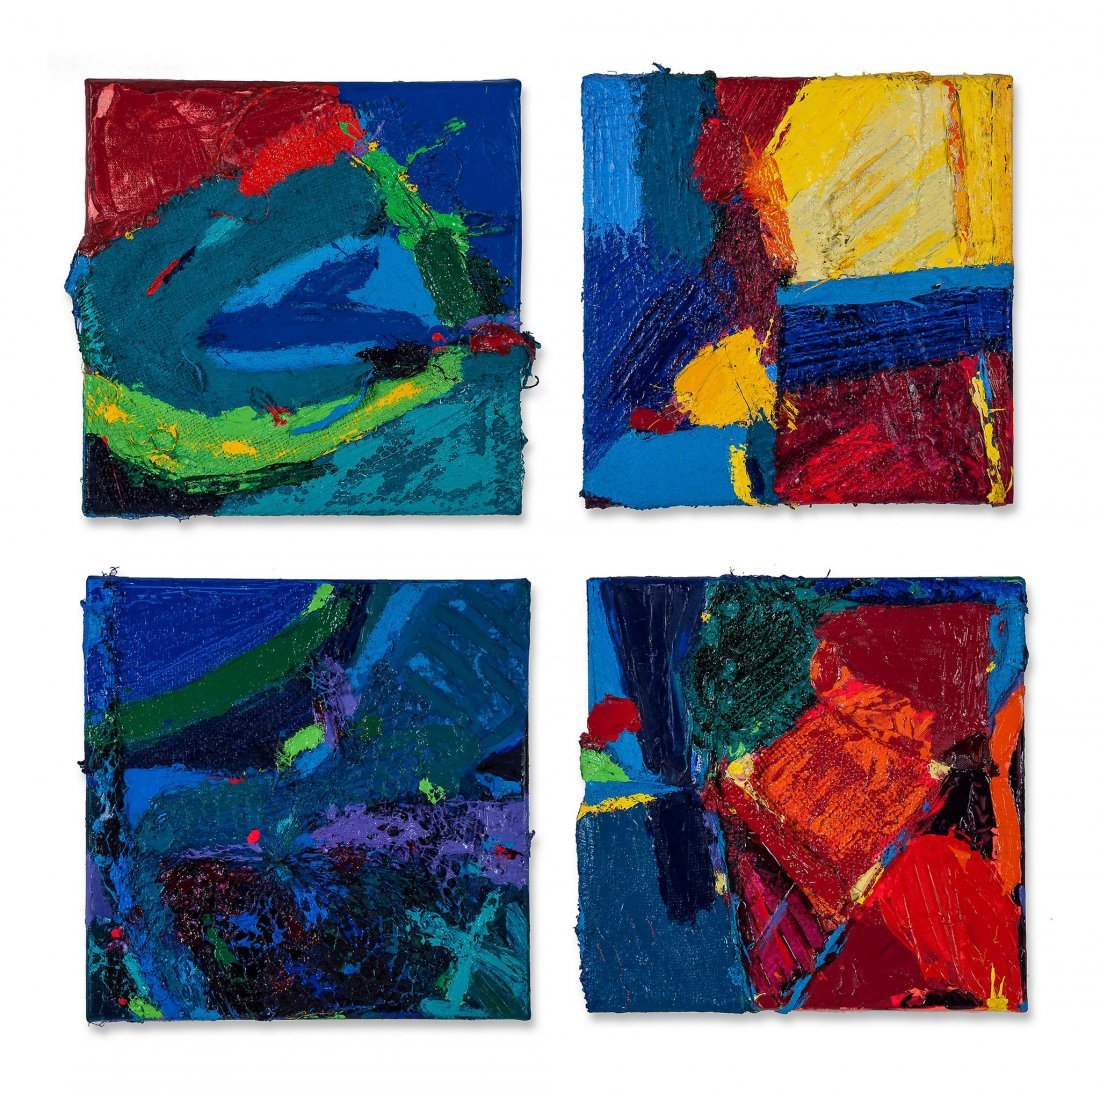 Anthony Frost (b.1951) - Orange goes Pop, Blue Blue,